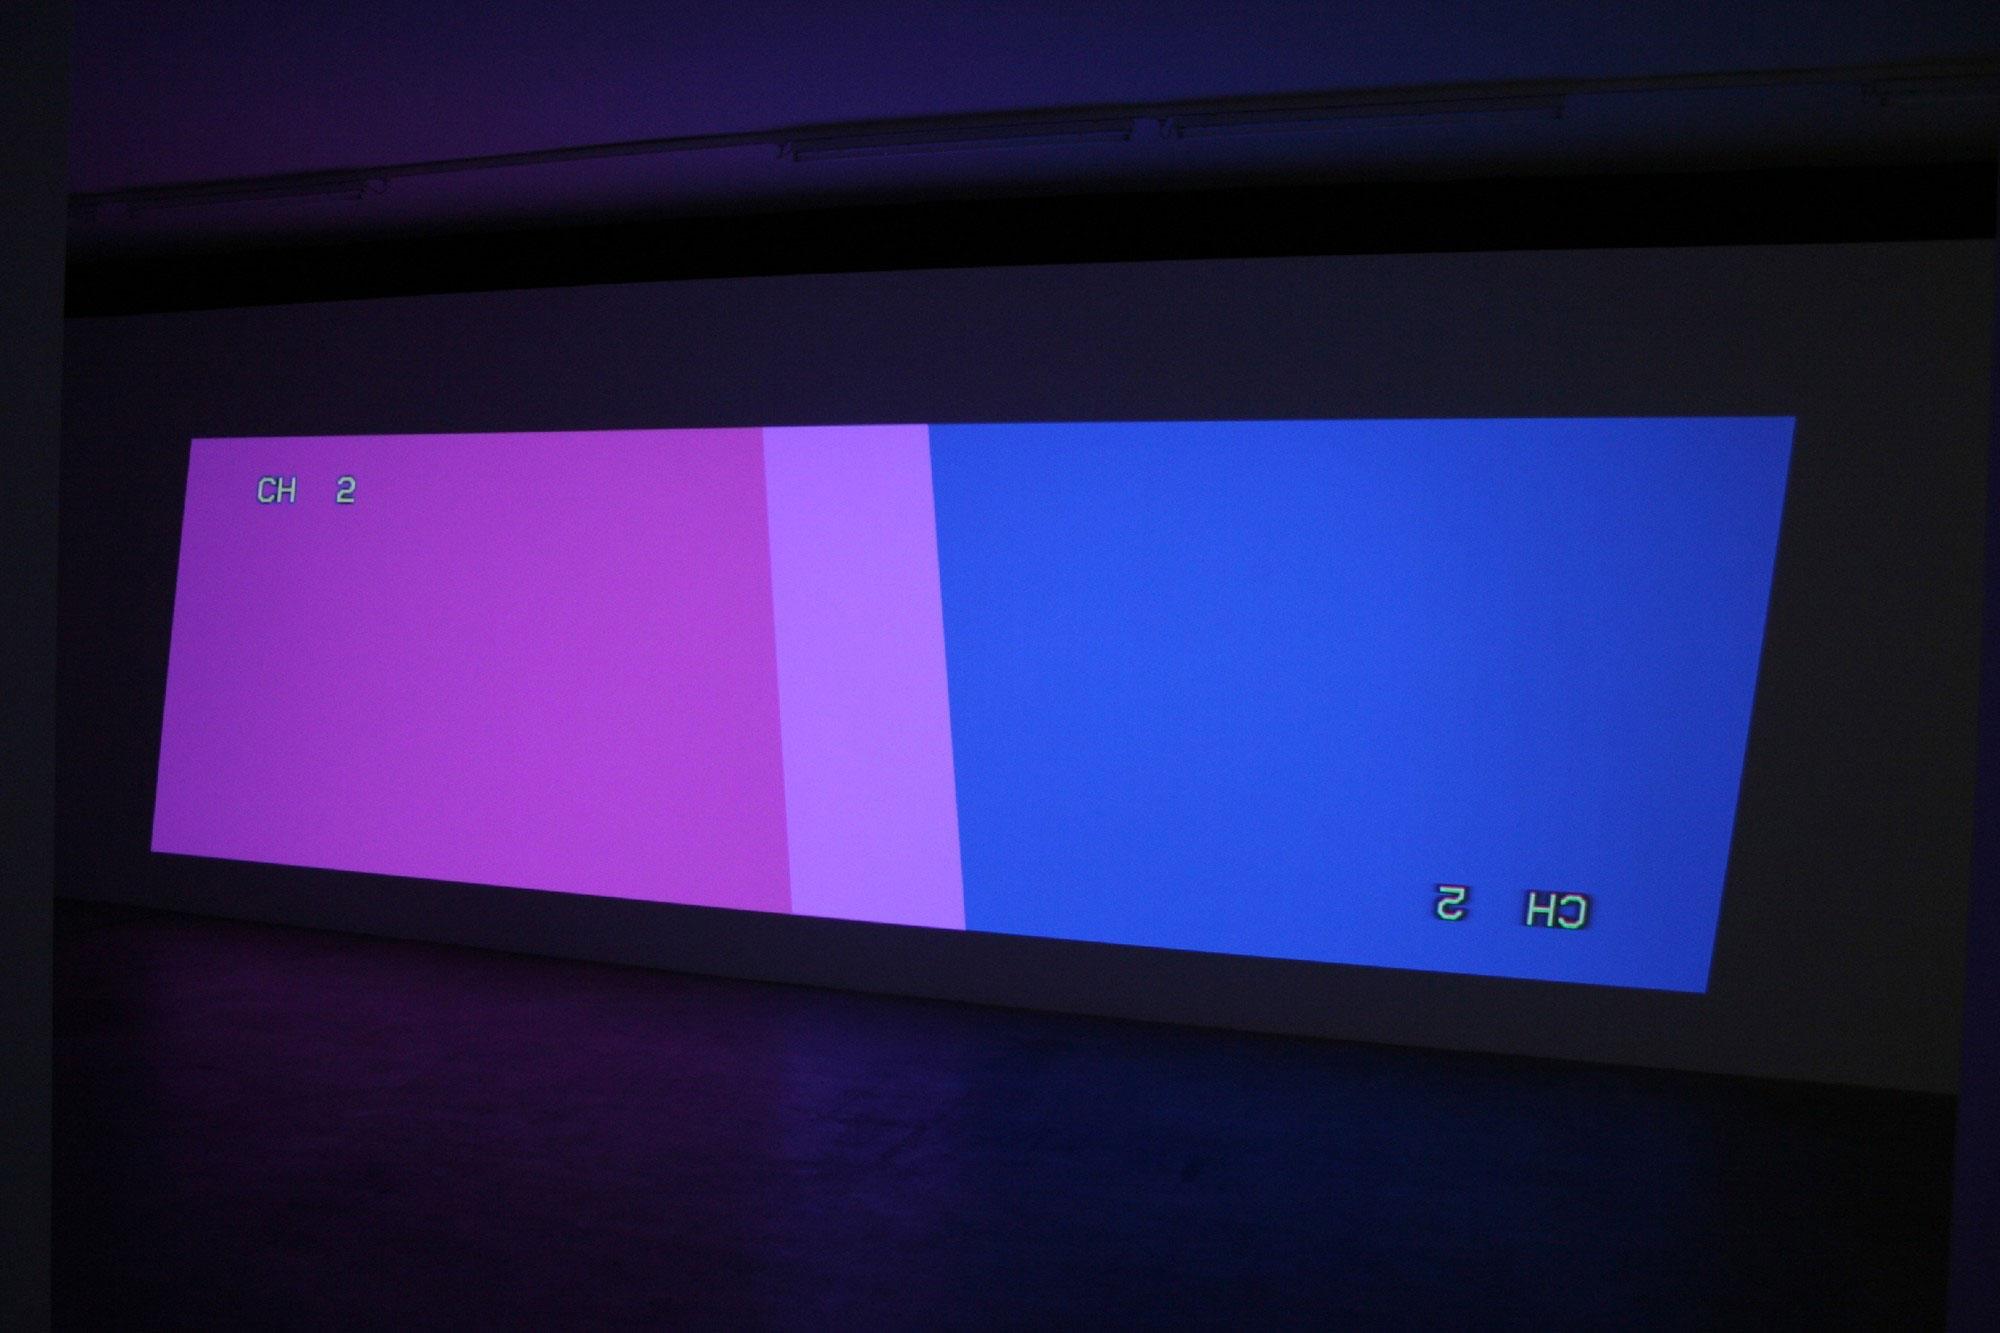 Cory Arcangel: Two Key-stoned Projectors (one upside down version 2)